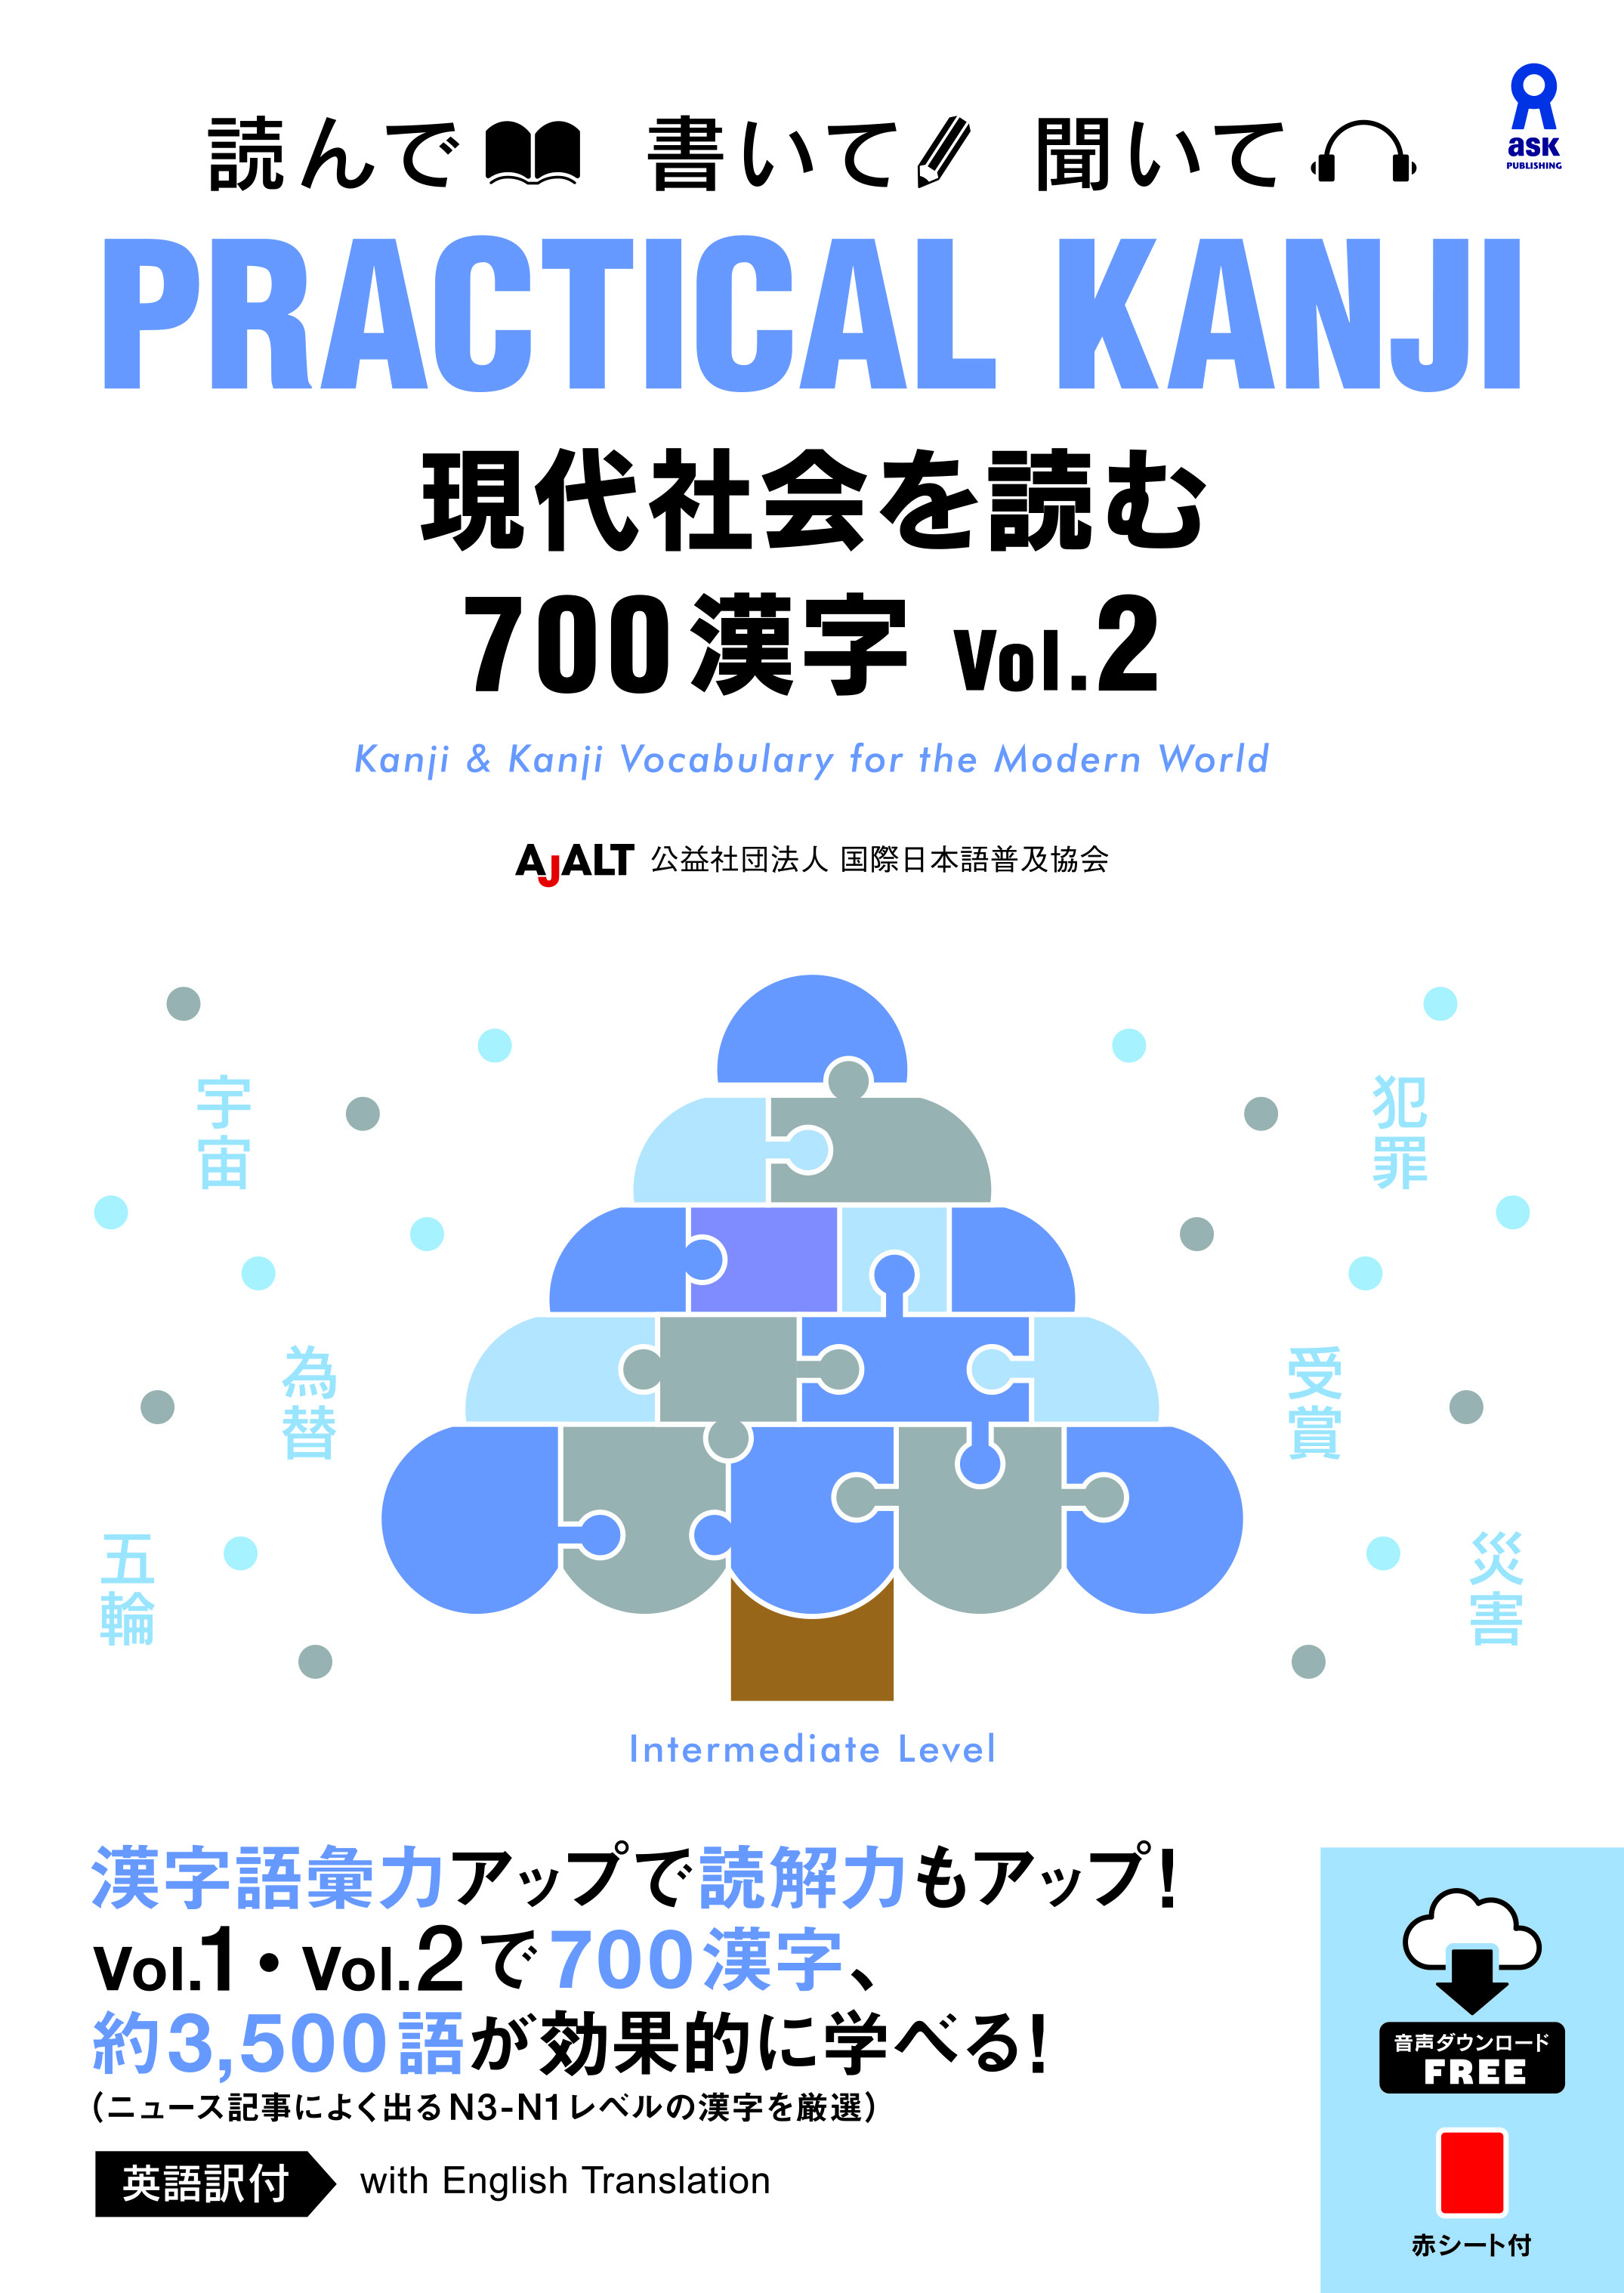 PRACTICAL KANJI 現代社会を読む700漢字 Vol.2画像